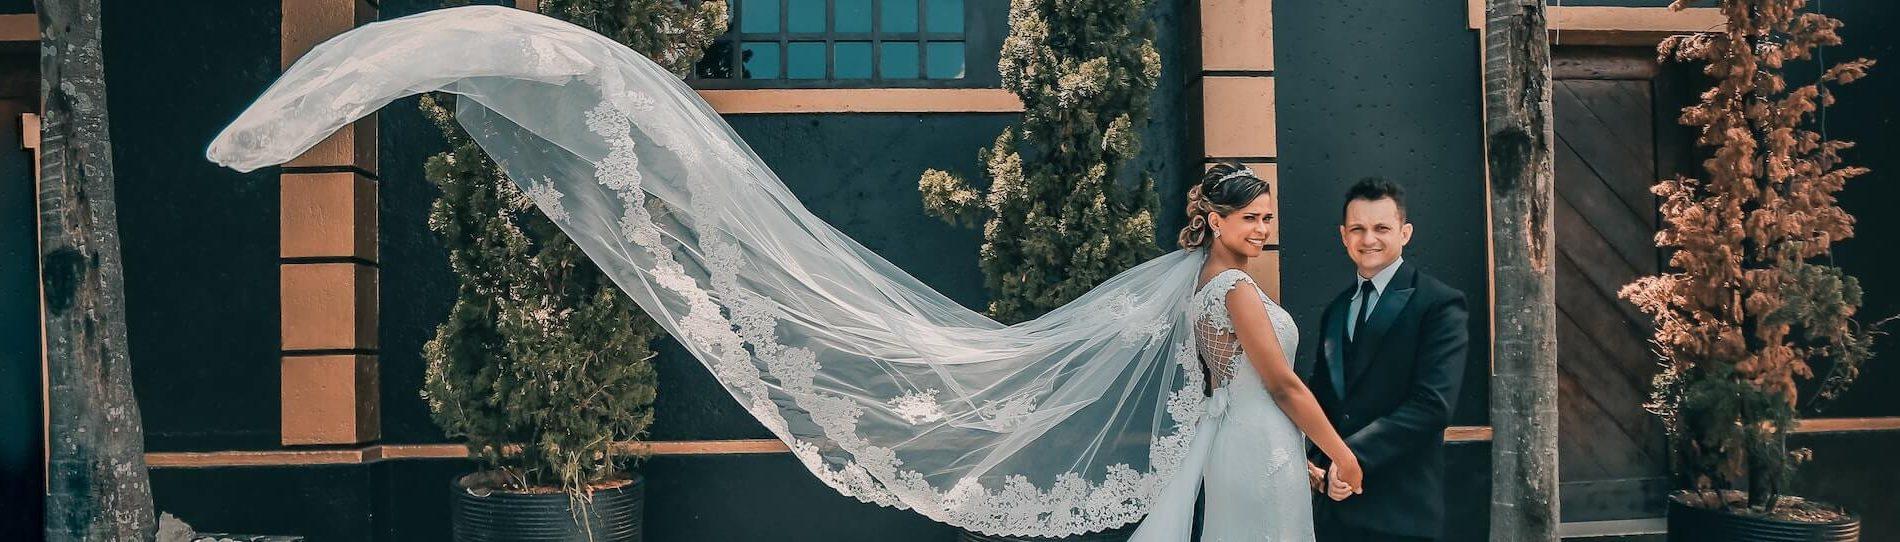 professional wedding photographers perth